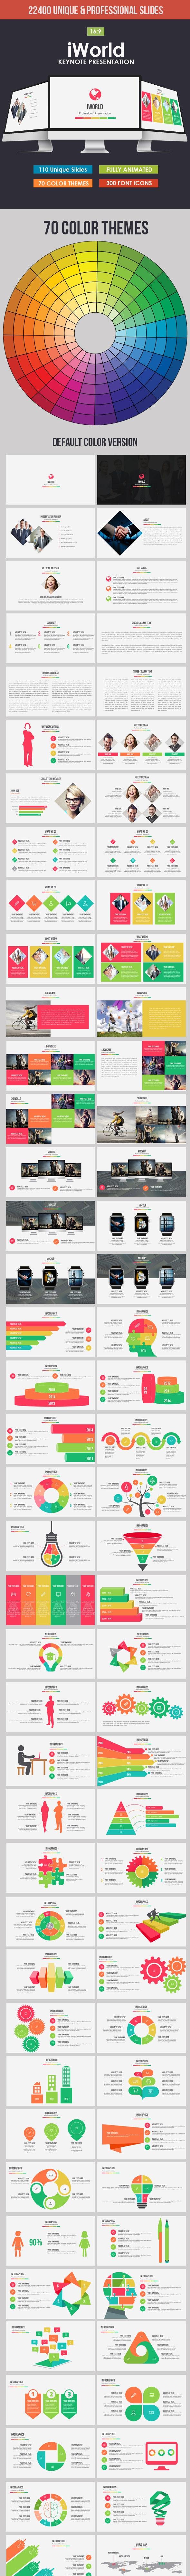 iWorld - Keynote Presentation Template - Business Keynote Templates